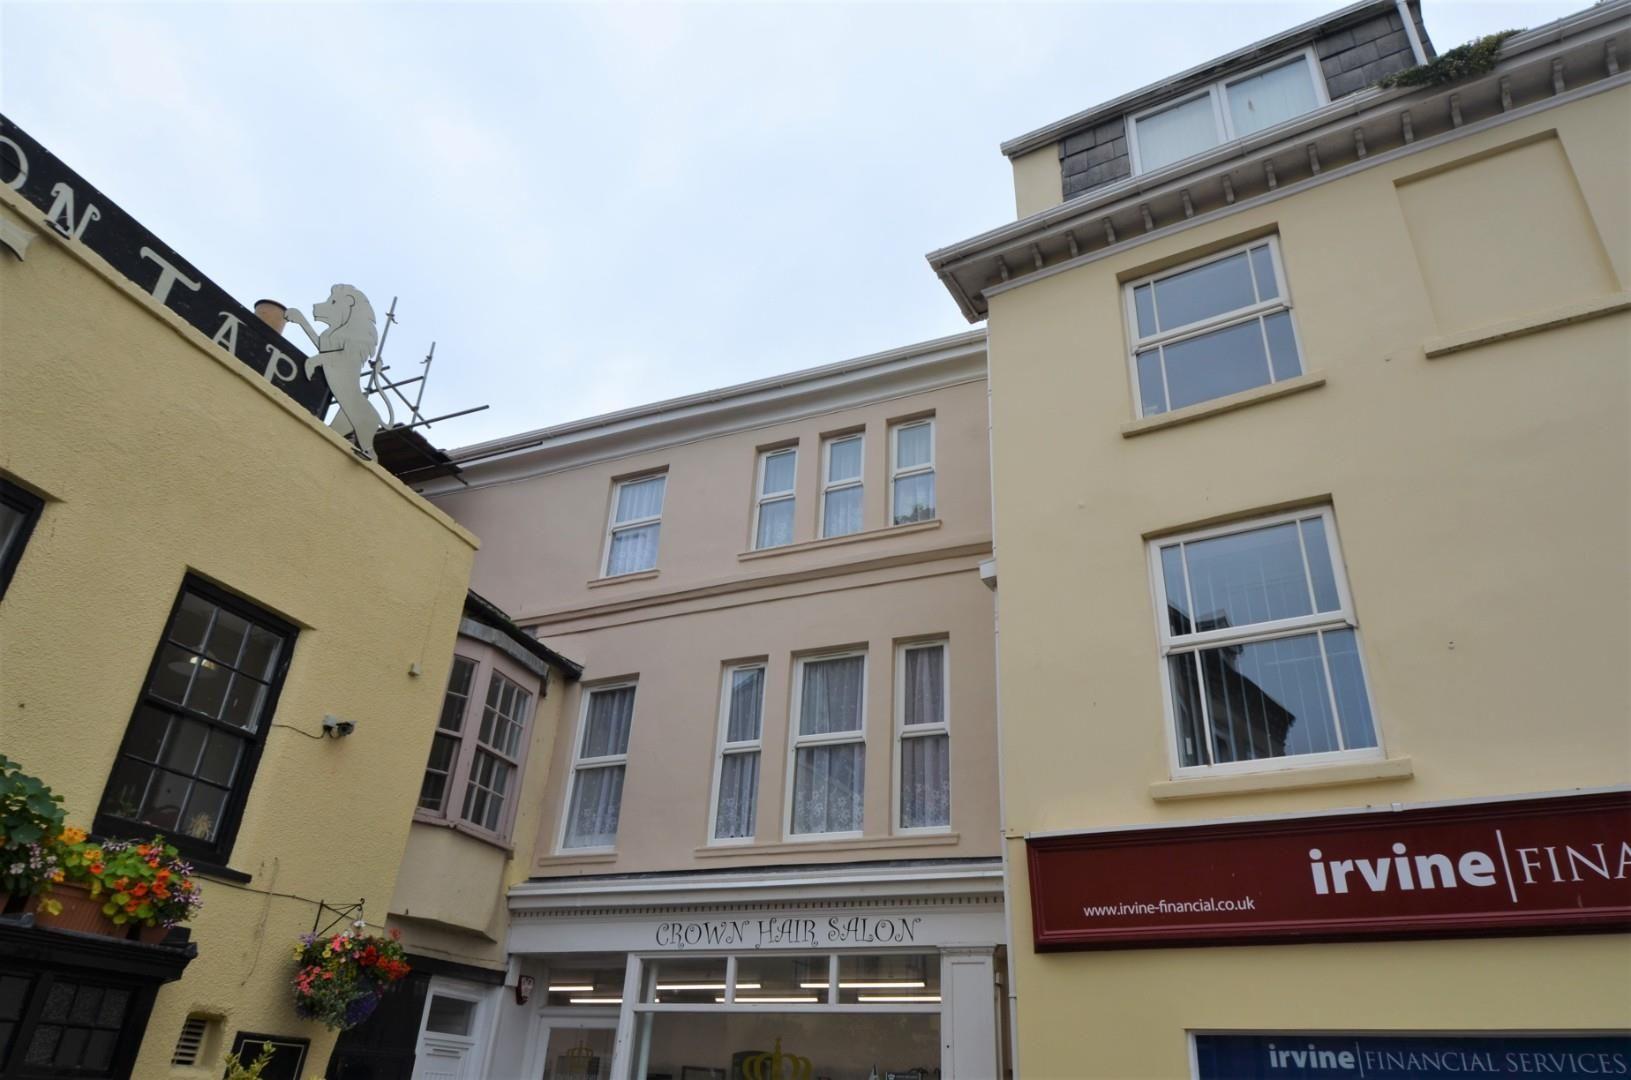 Property photo 1 of 6. Dsc_0068.Jpg